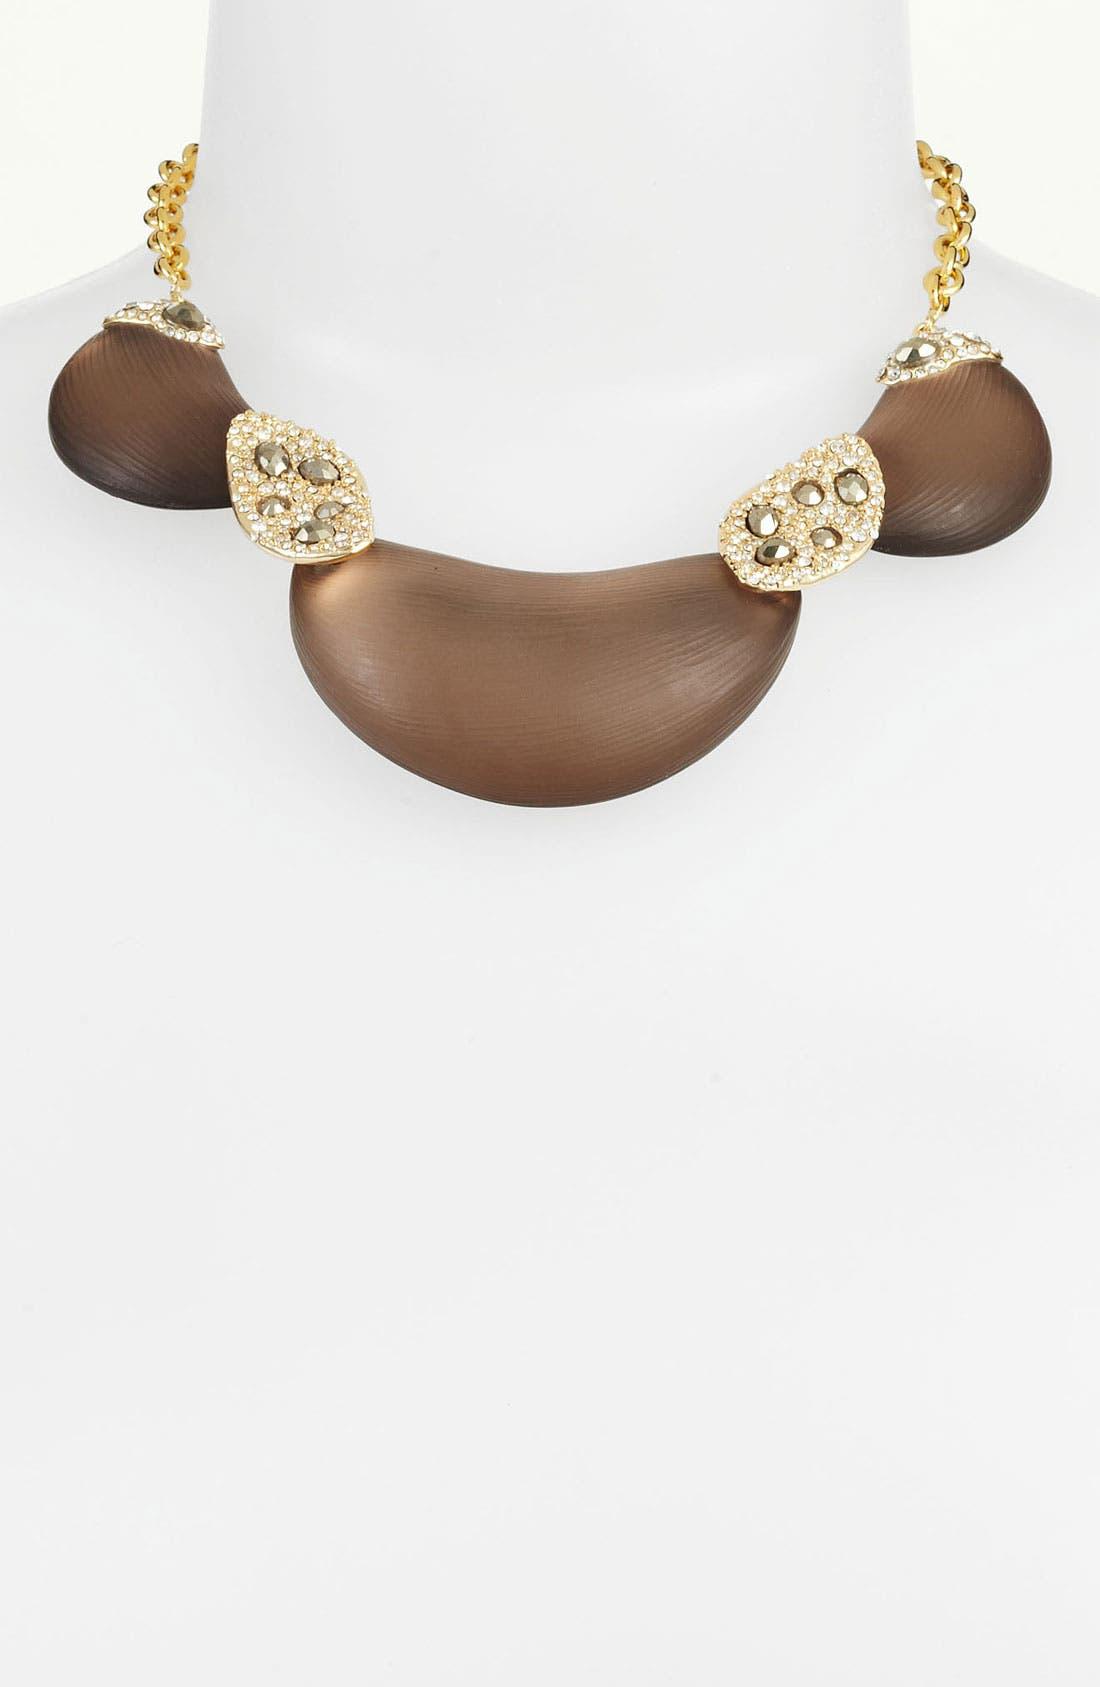 Alternate Image 1 Selected - Alexis Bittar 'Modular' Encrusted Bib Necklace